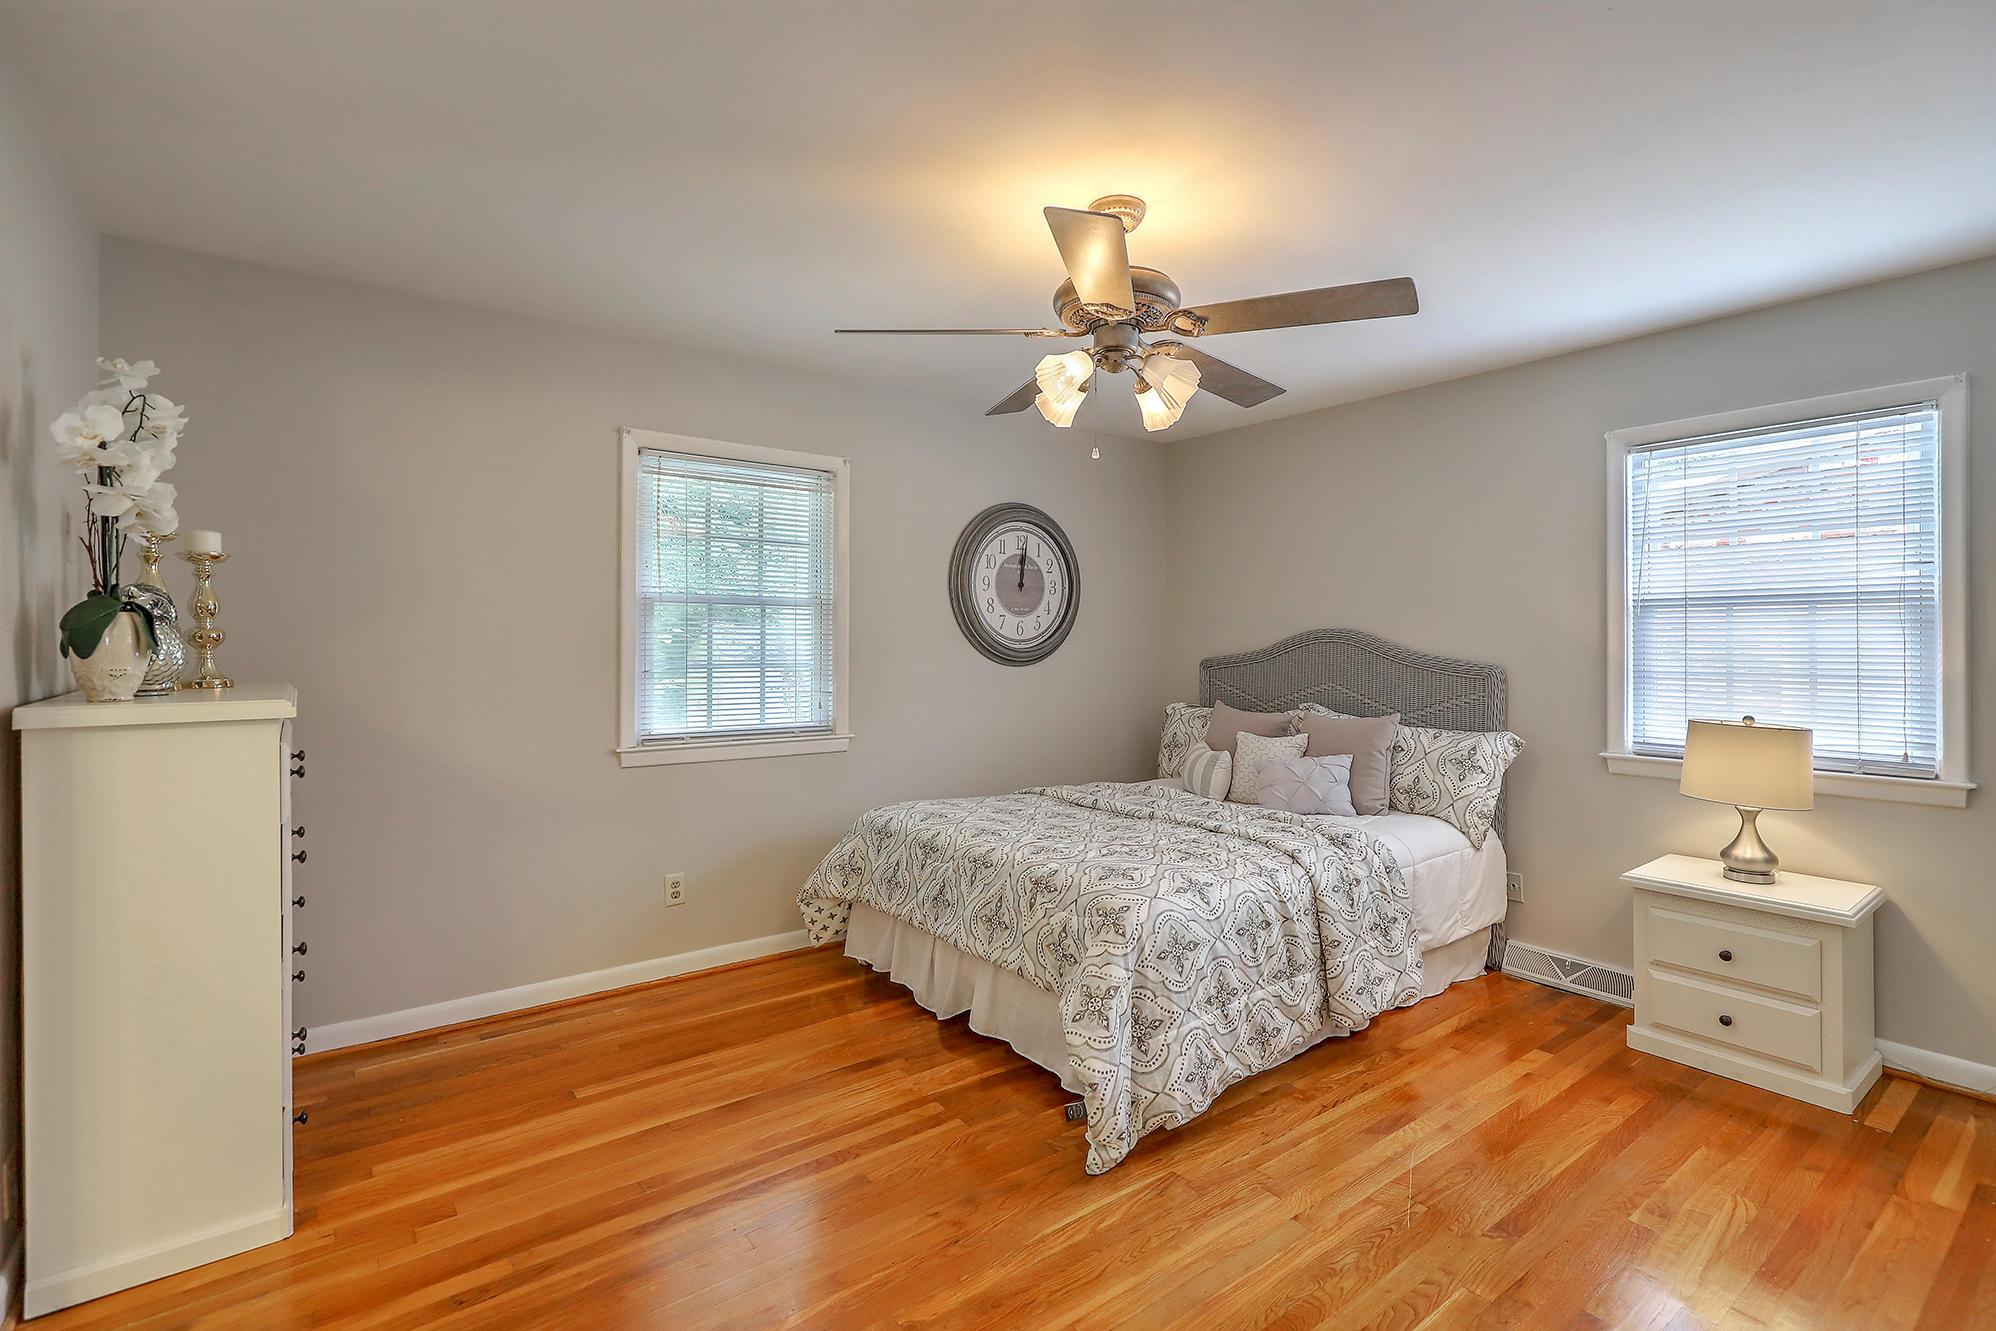 Charlestowne Estates III Homes For Sale - 1313 Coleridge, Charleston, SC - 17